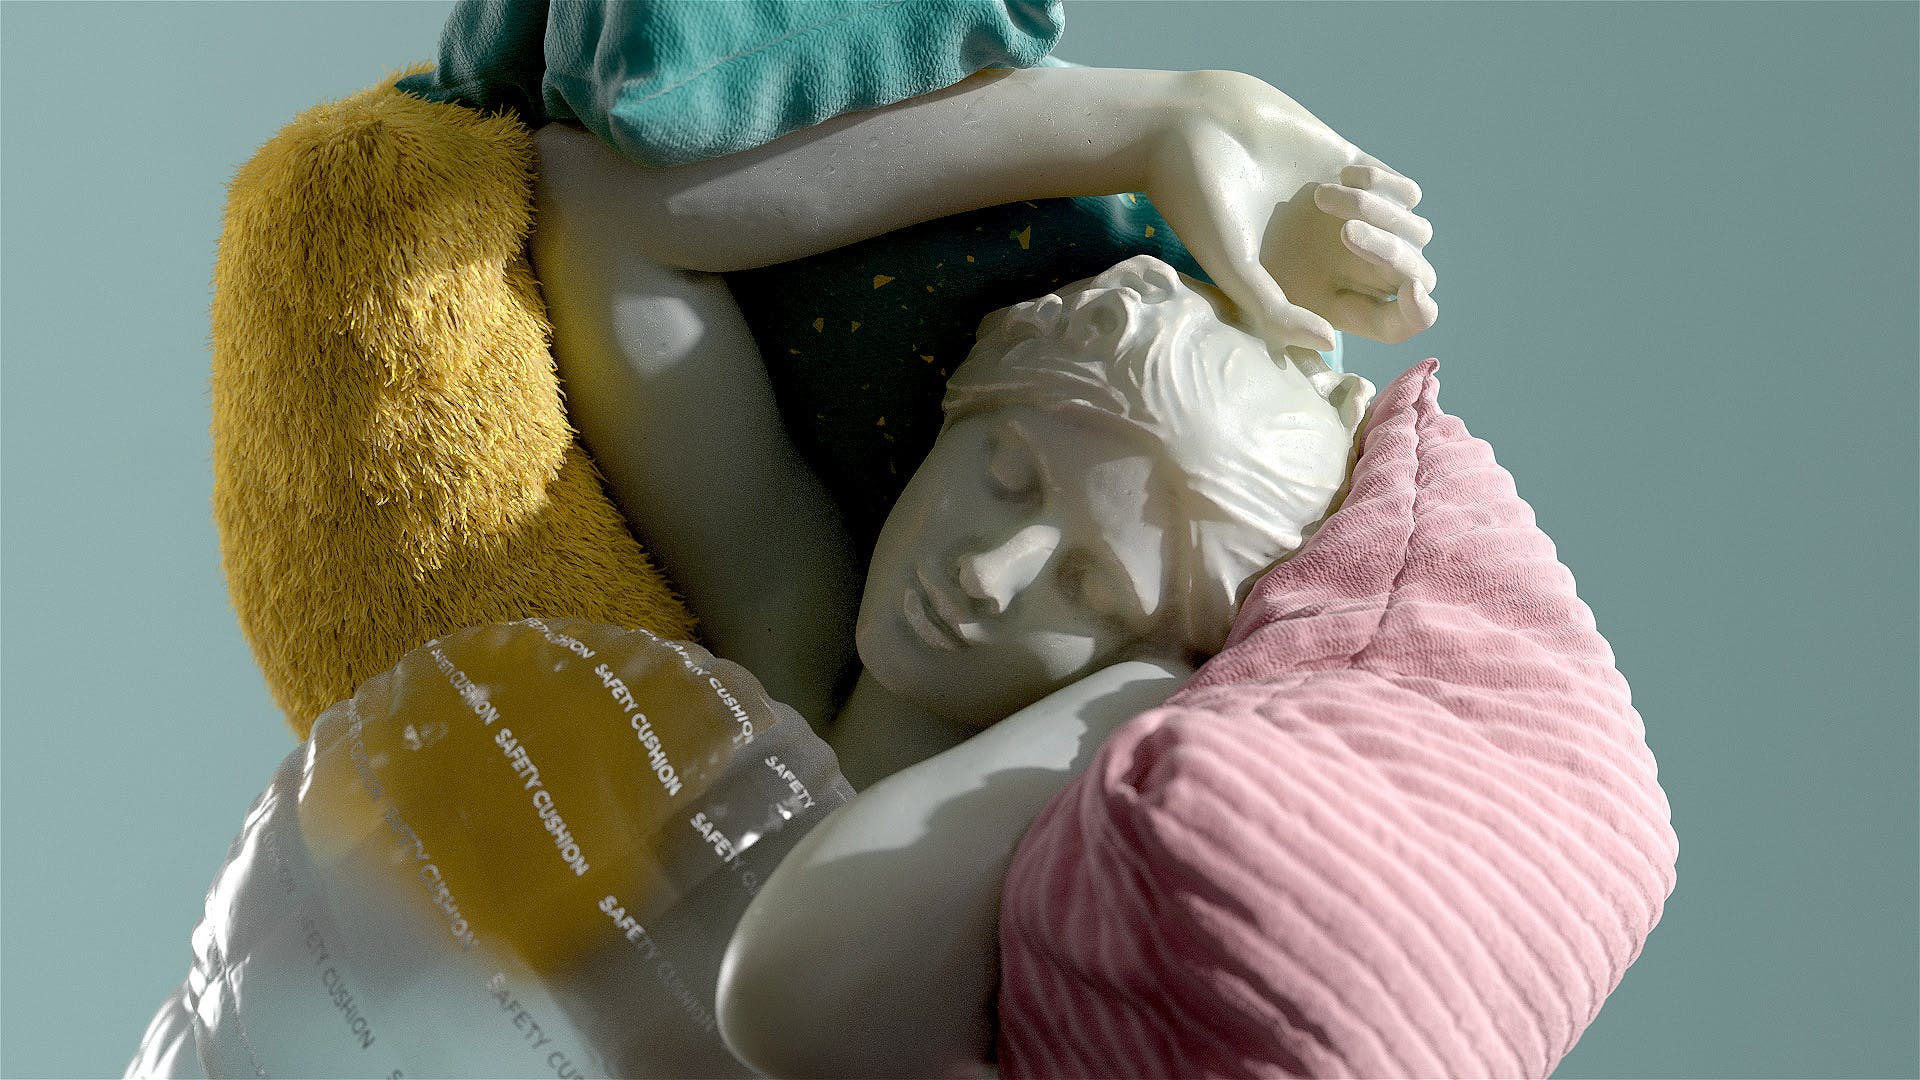 JESPER LINDBORG: EMOTIONAL ART GALLERY